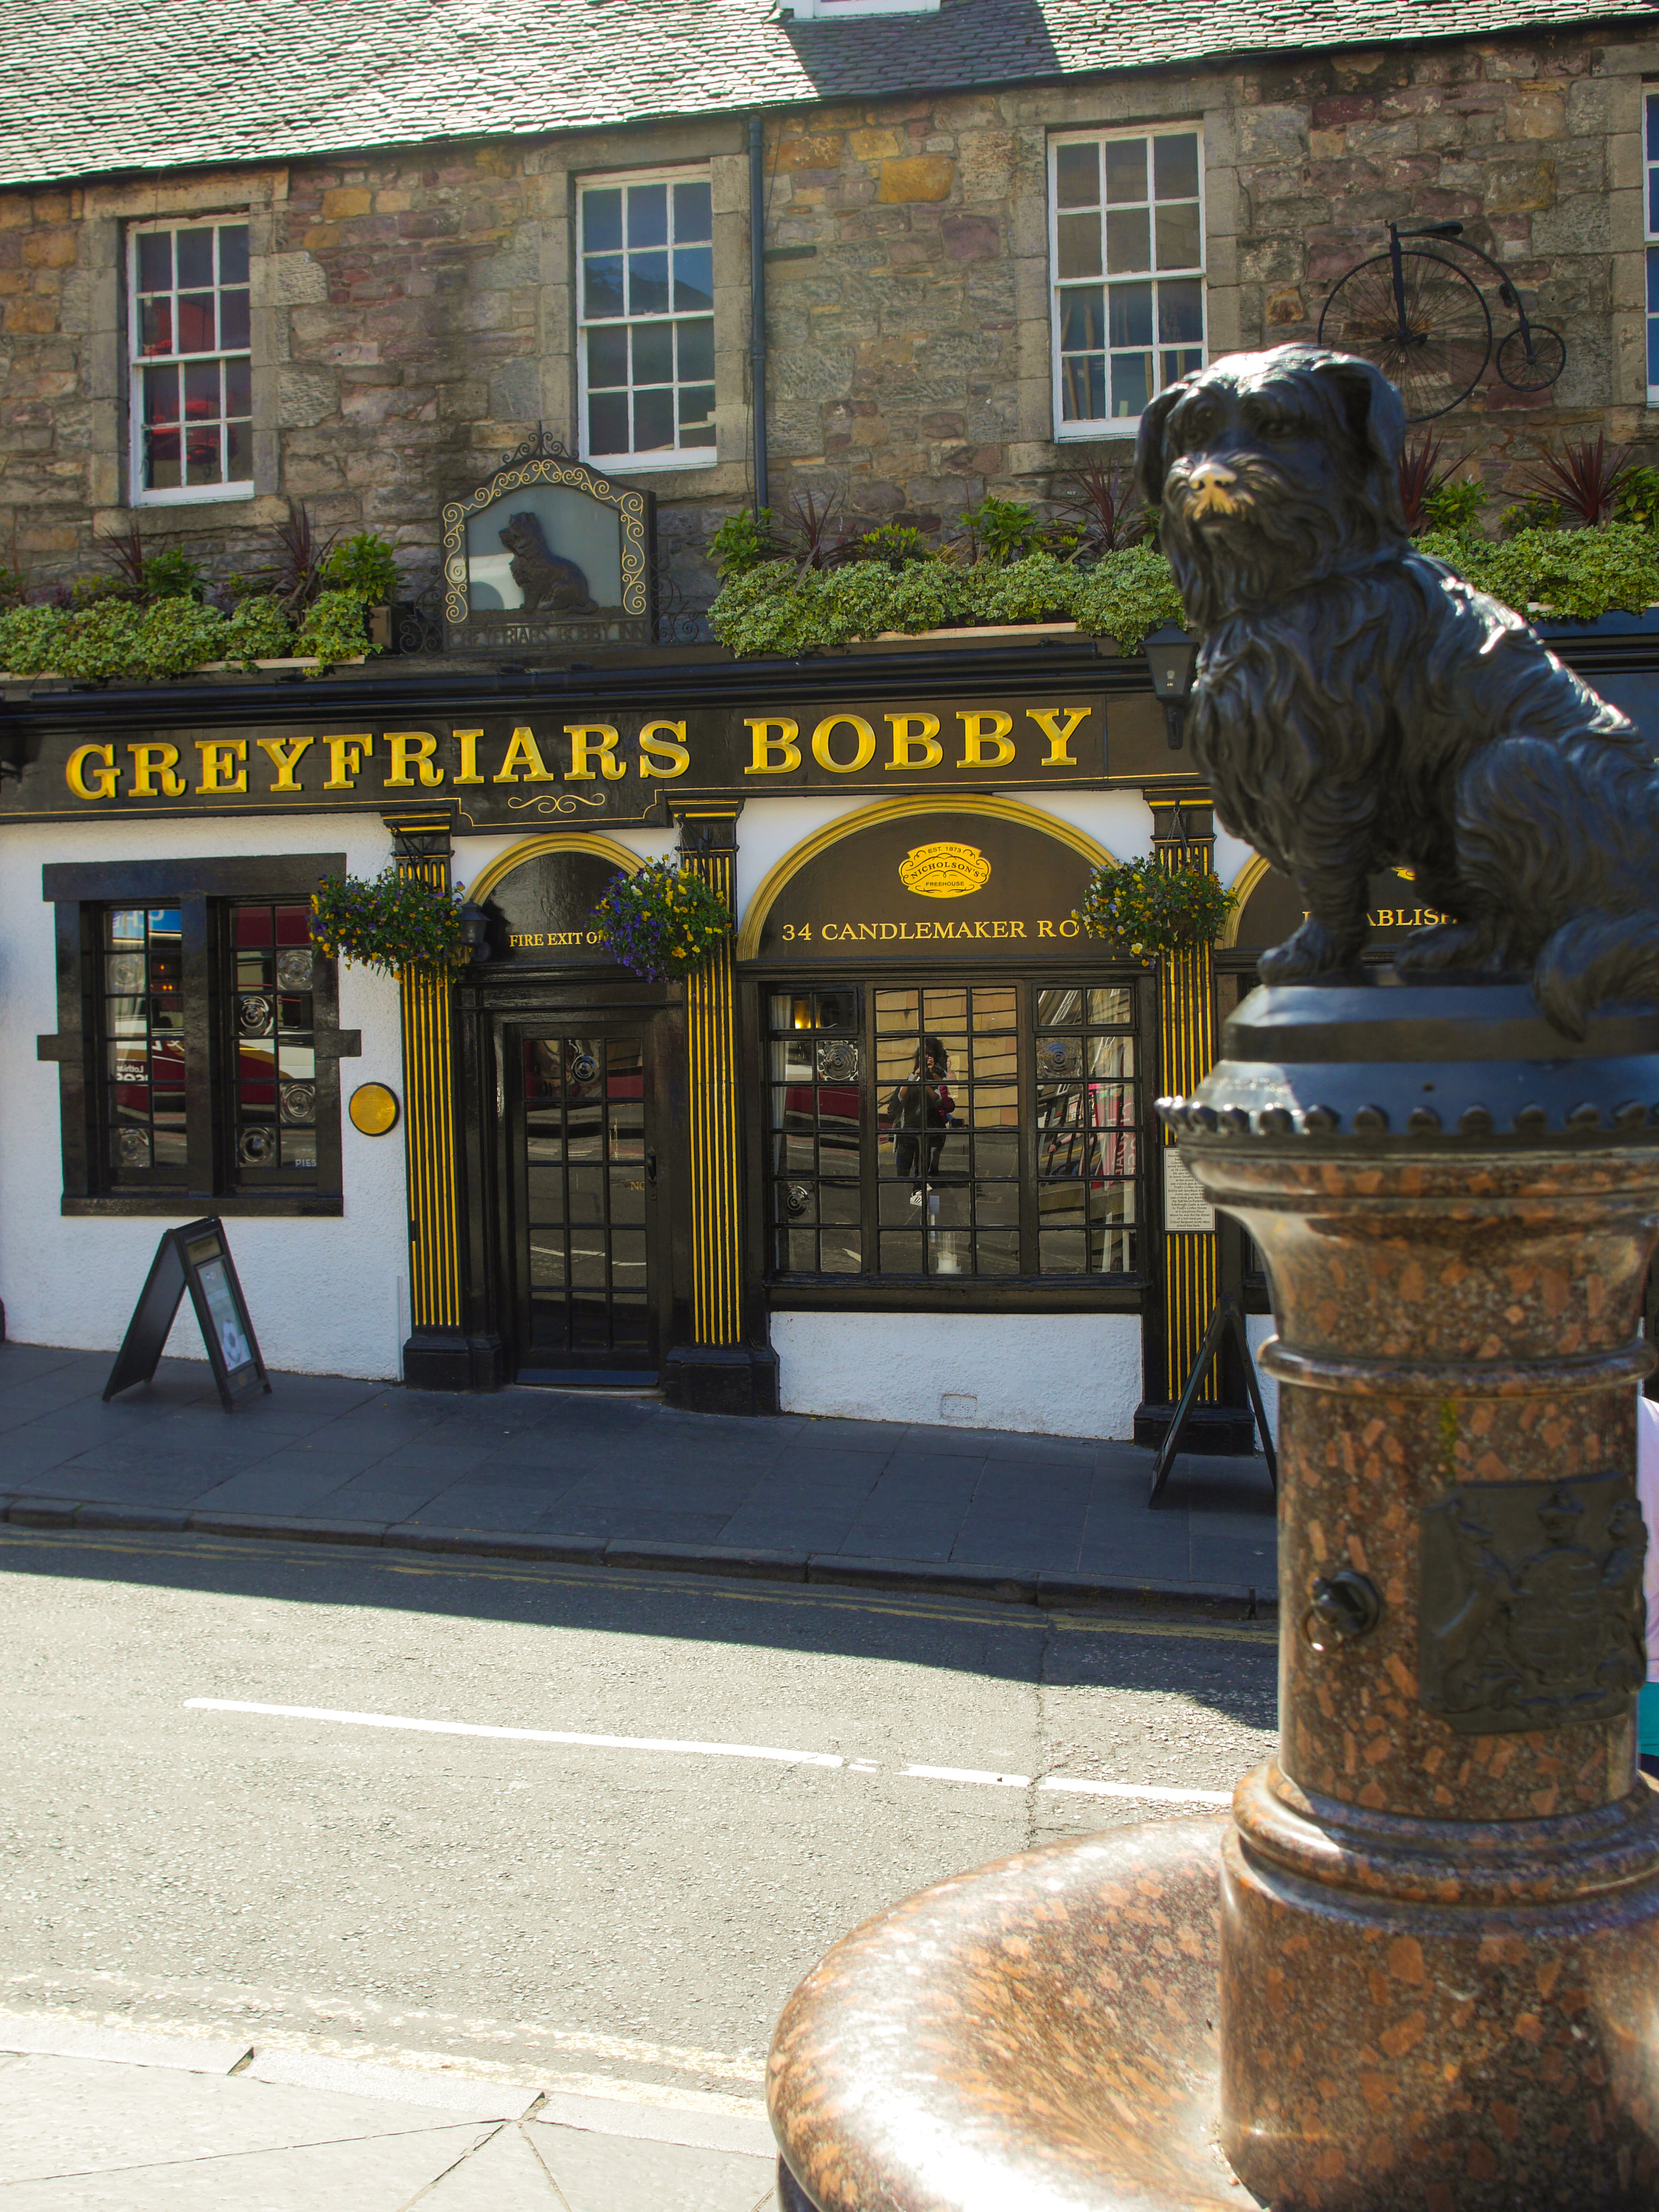 Greyfriars Bobby in Edinburgh, Scotland